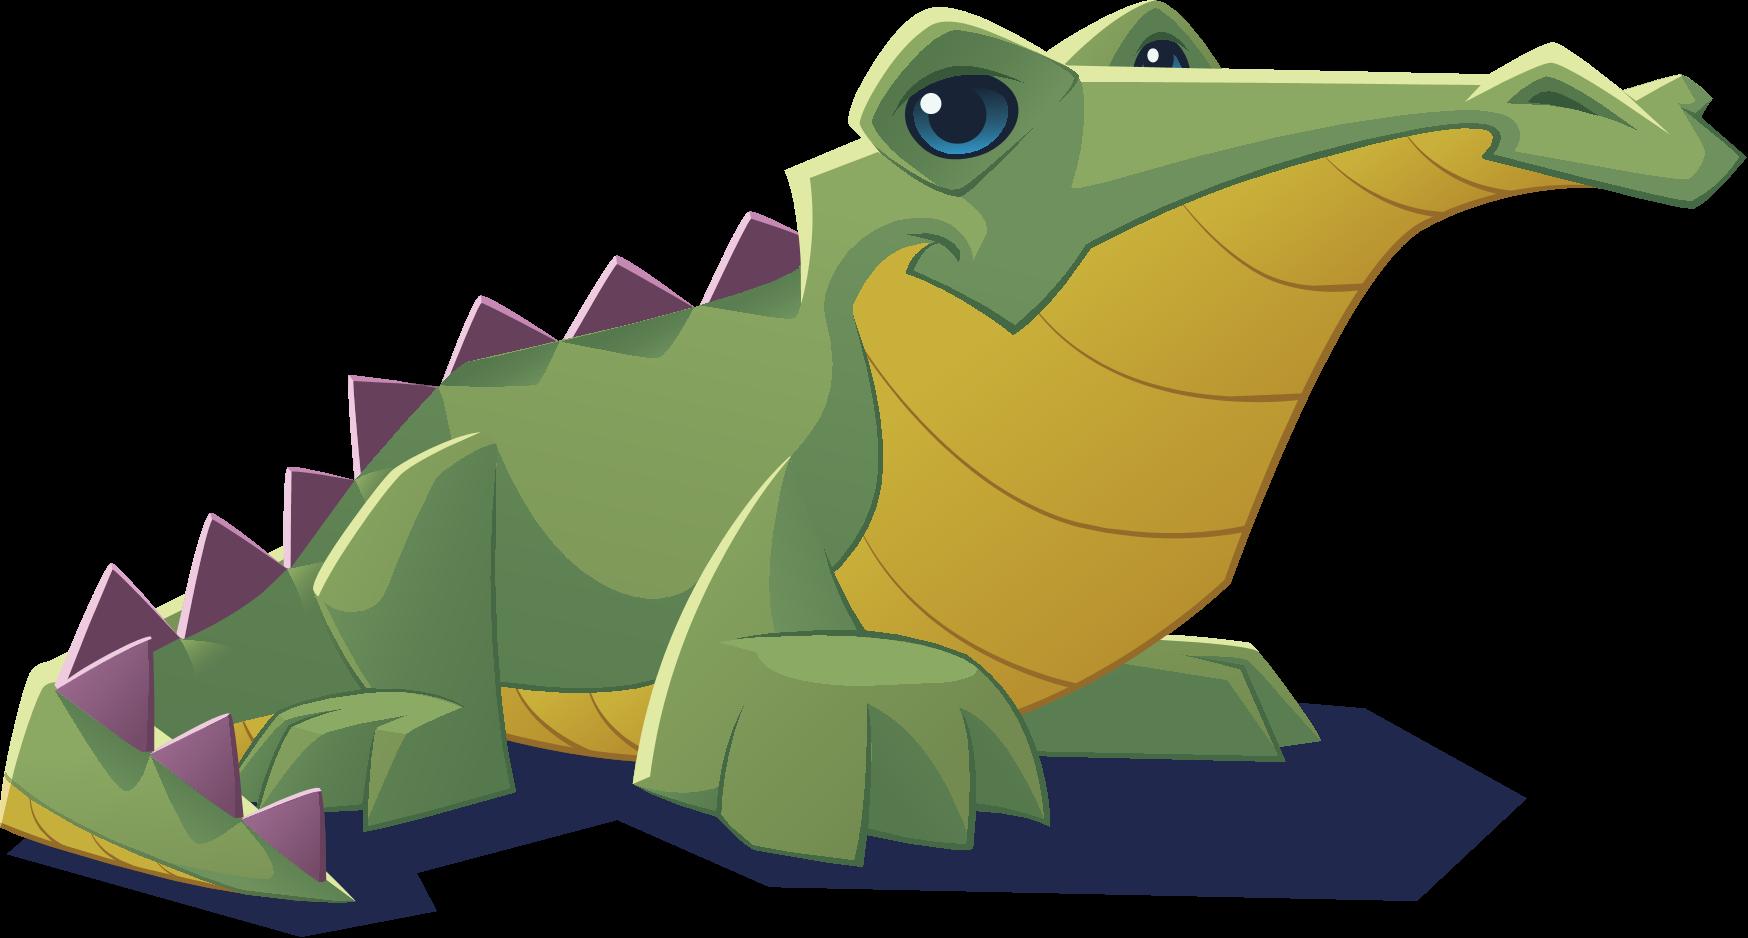 Lizard clipart land animal. Image renovated art croc